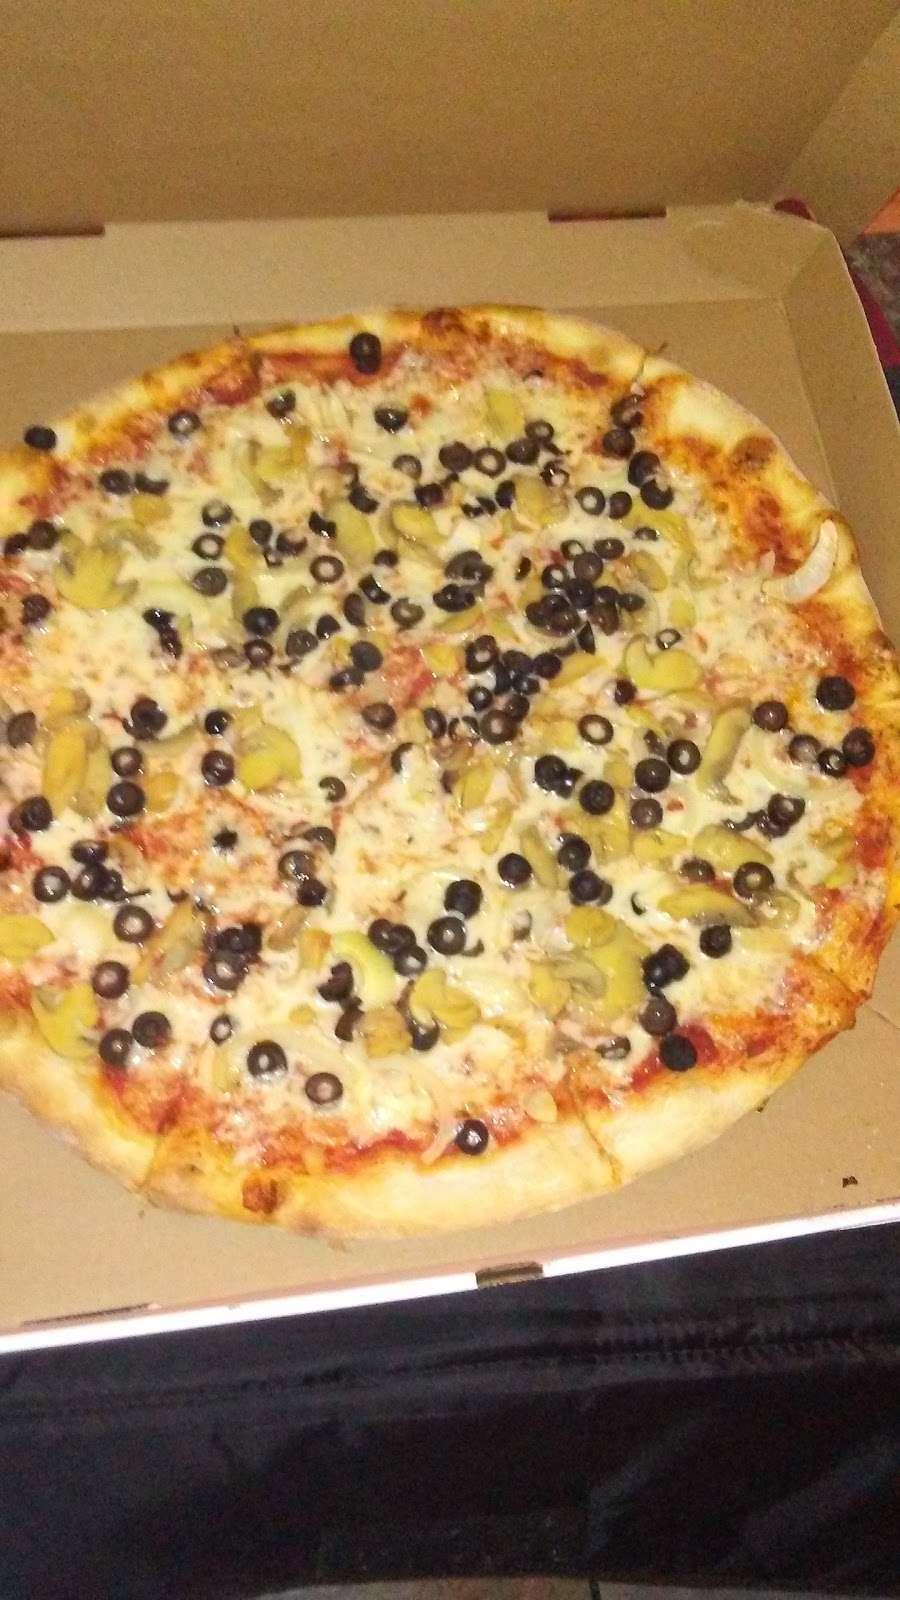 Salerno Pizza - meal delivery  | Photo 7 of 10 | Address: 364 Summit Ave, Jersey City, NJ 07306, USA | Phone: (201) 918-2345